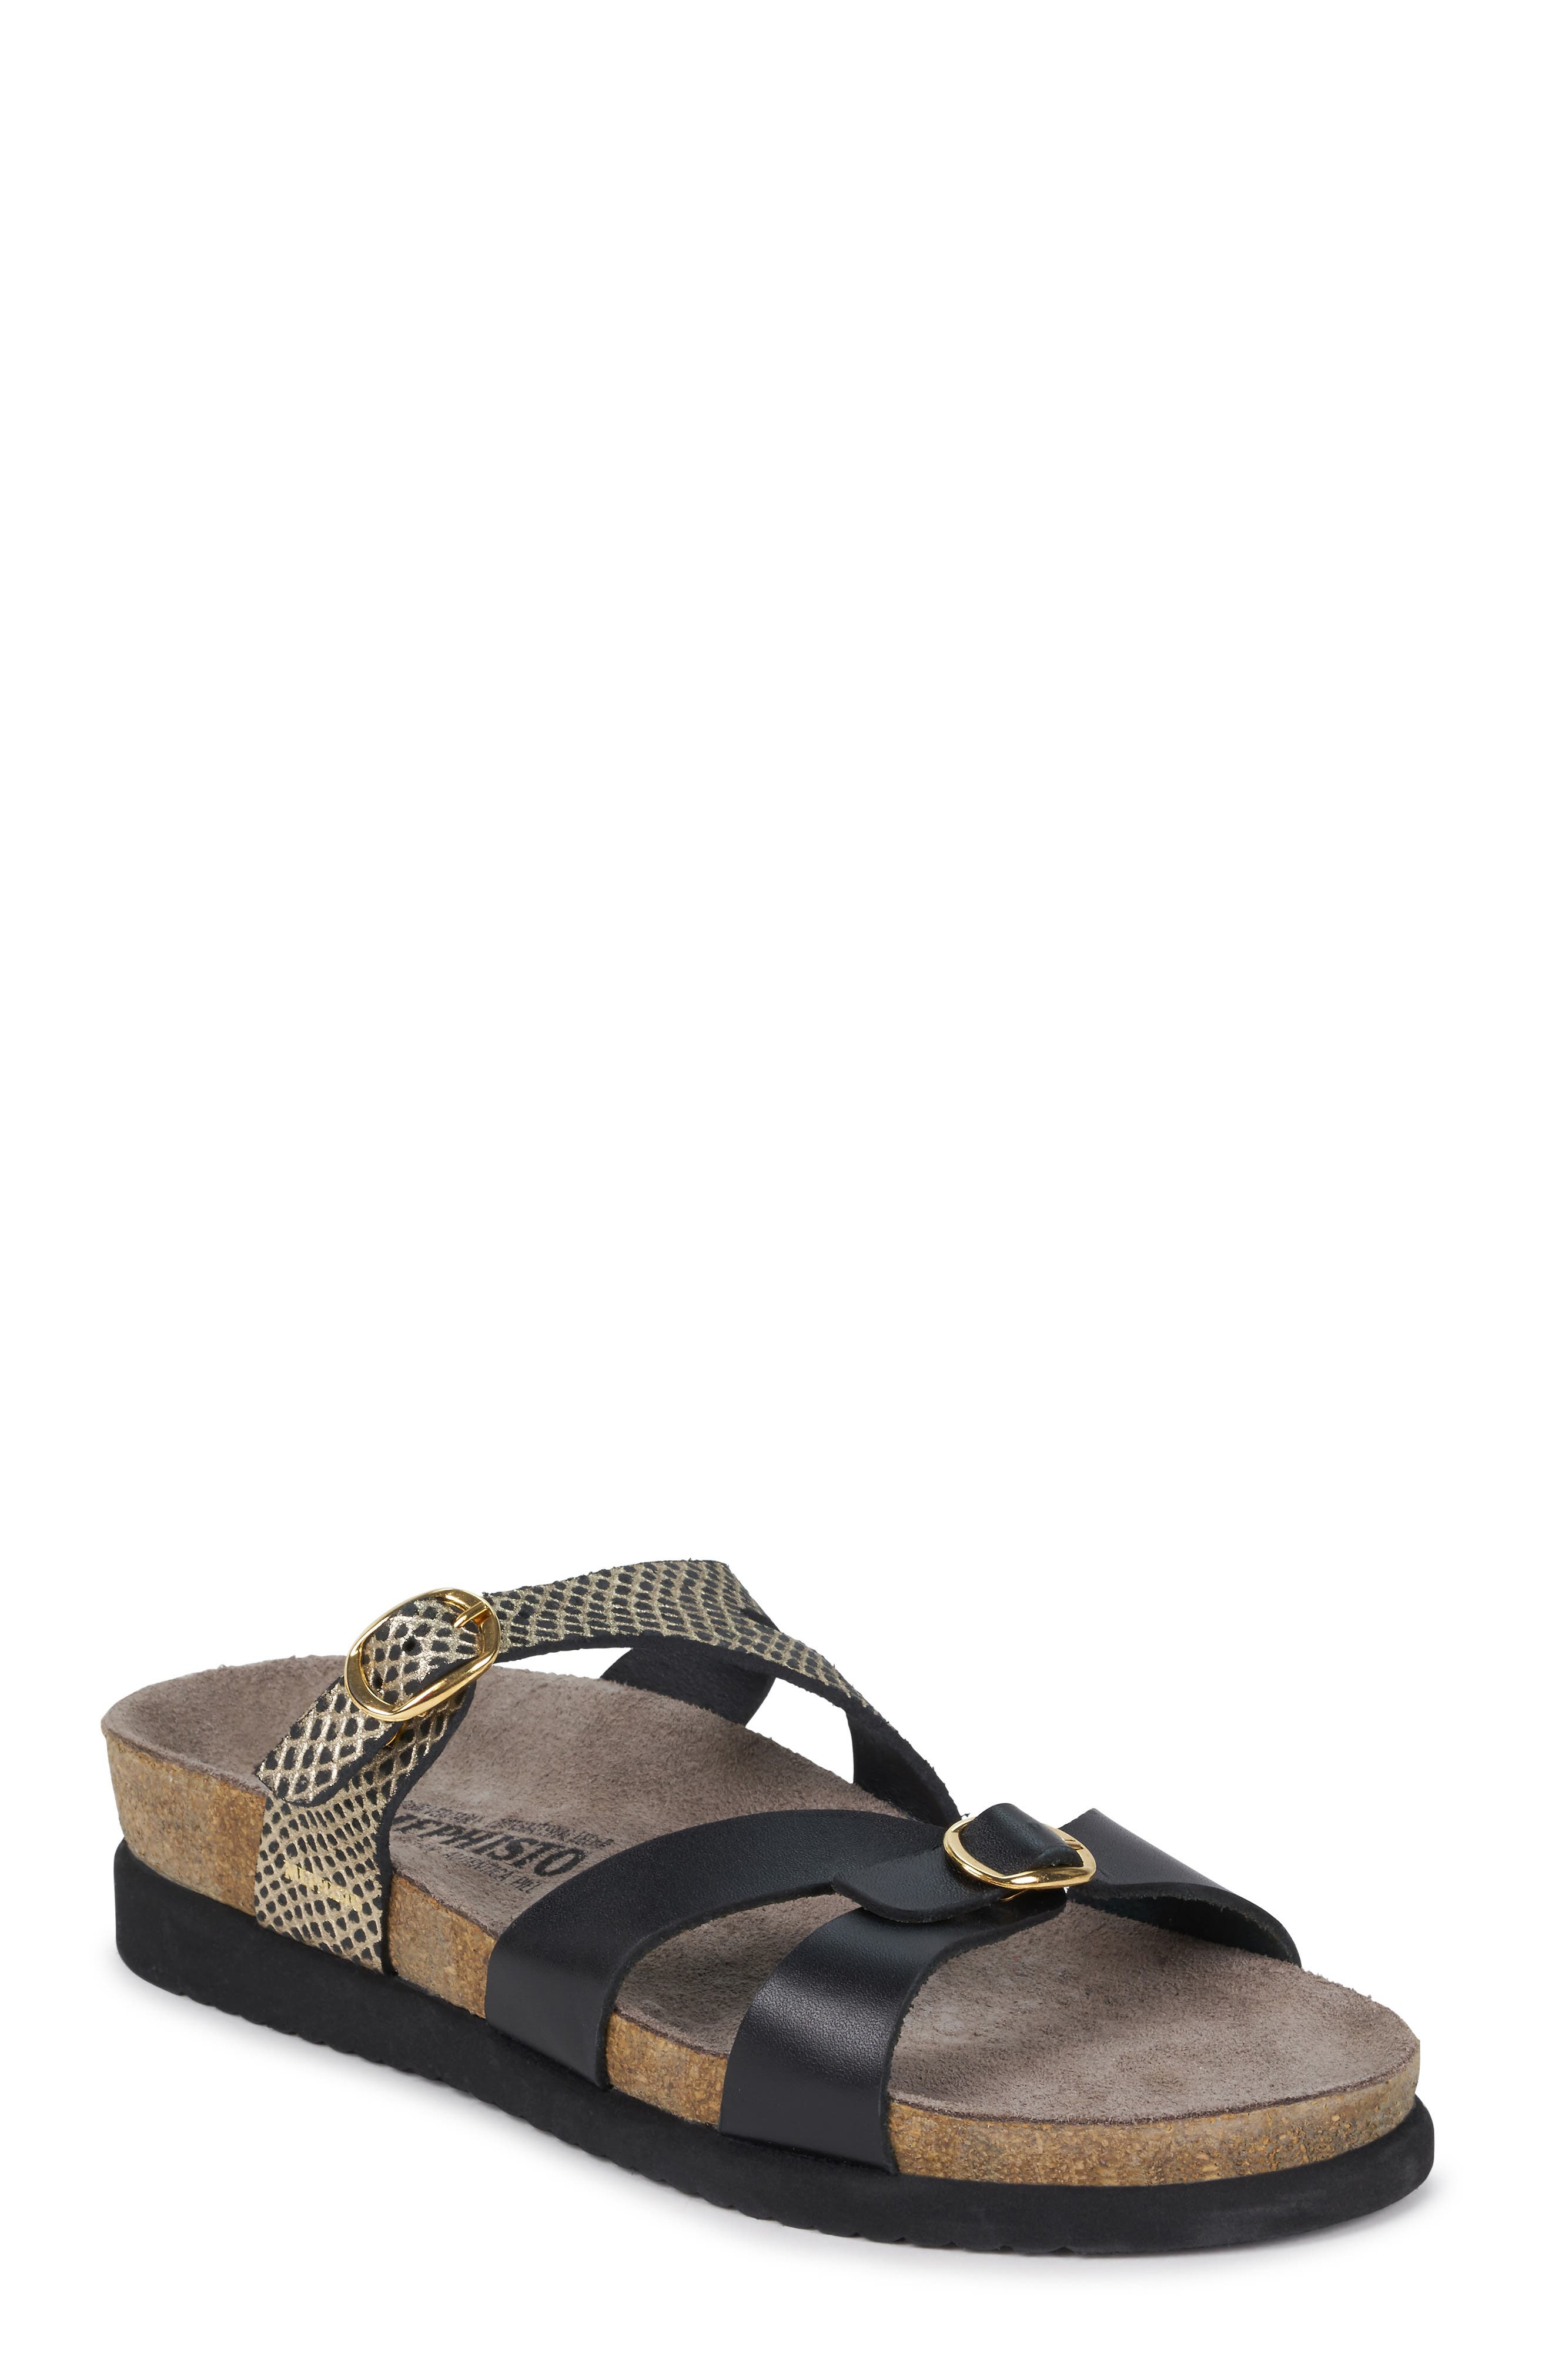 MEPHISTO 'Hannel' Sandal, Main, color, BLACK CUBA WAXY LEATHER